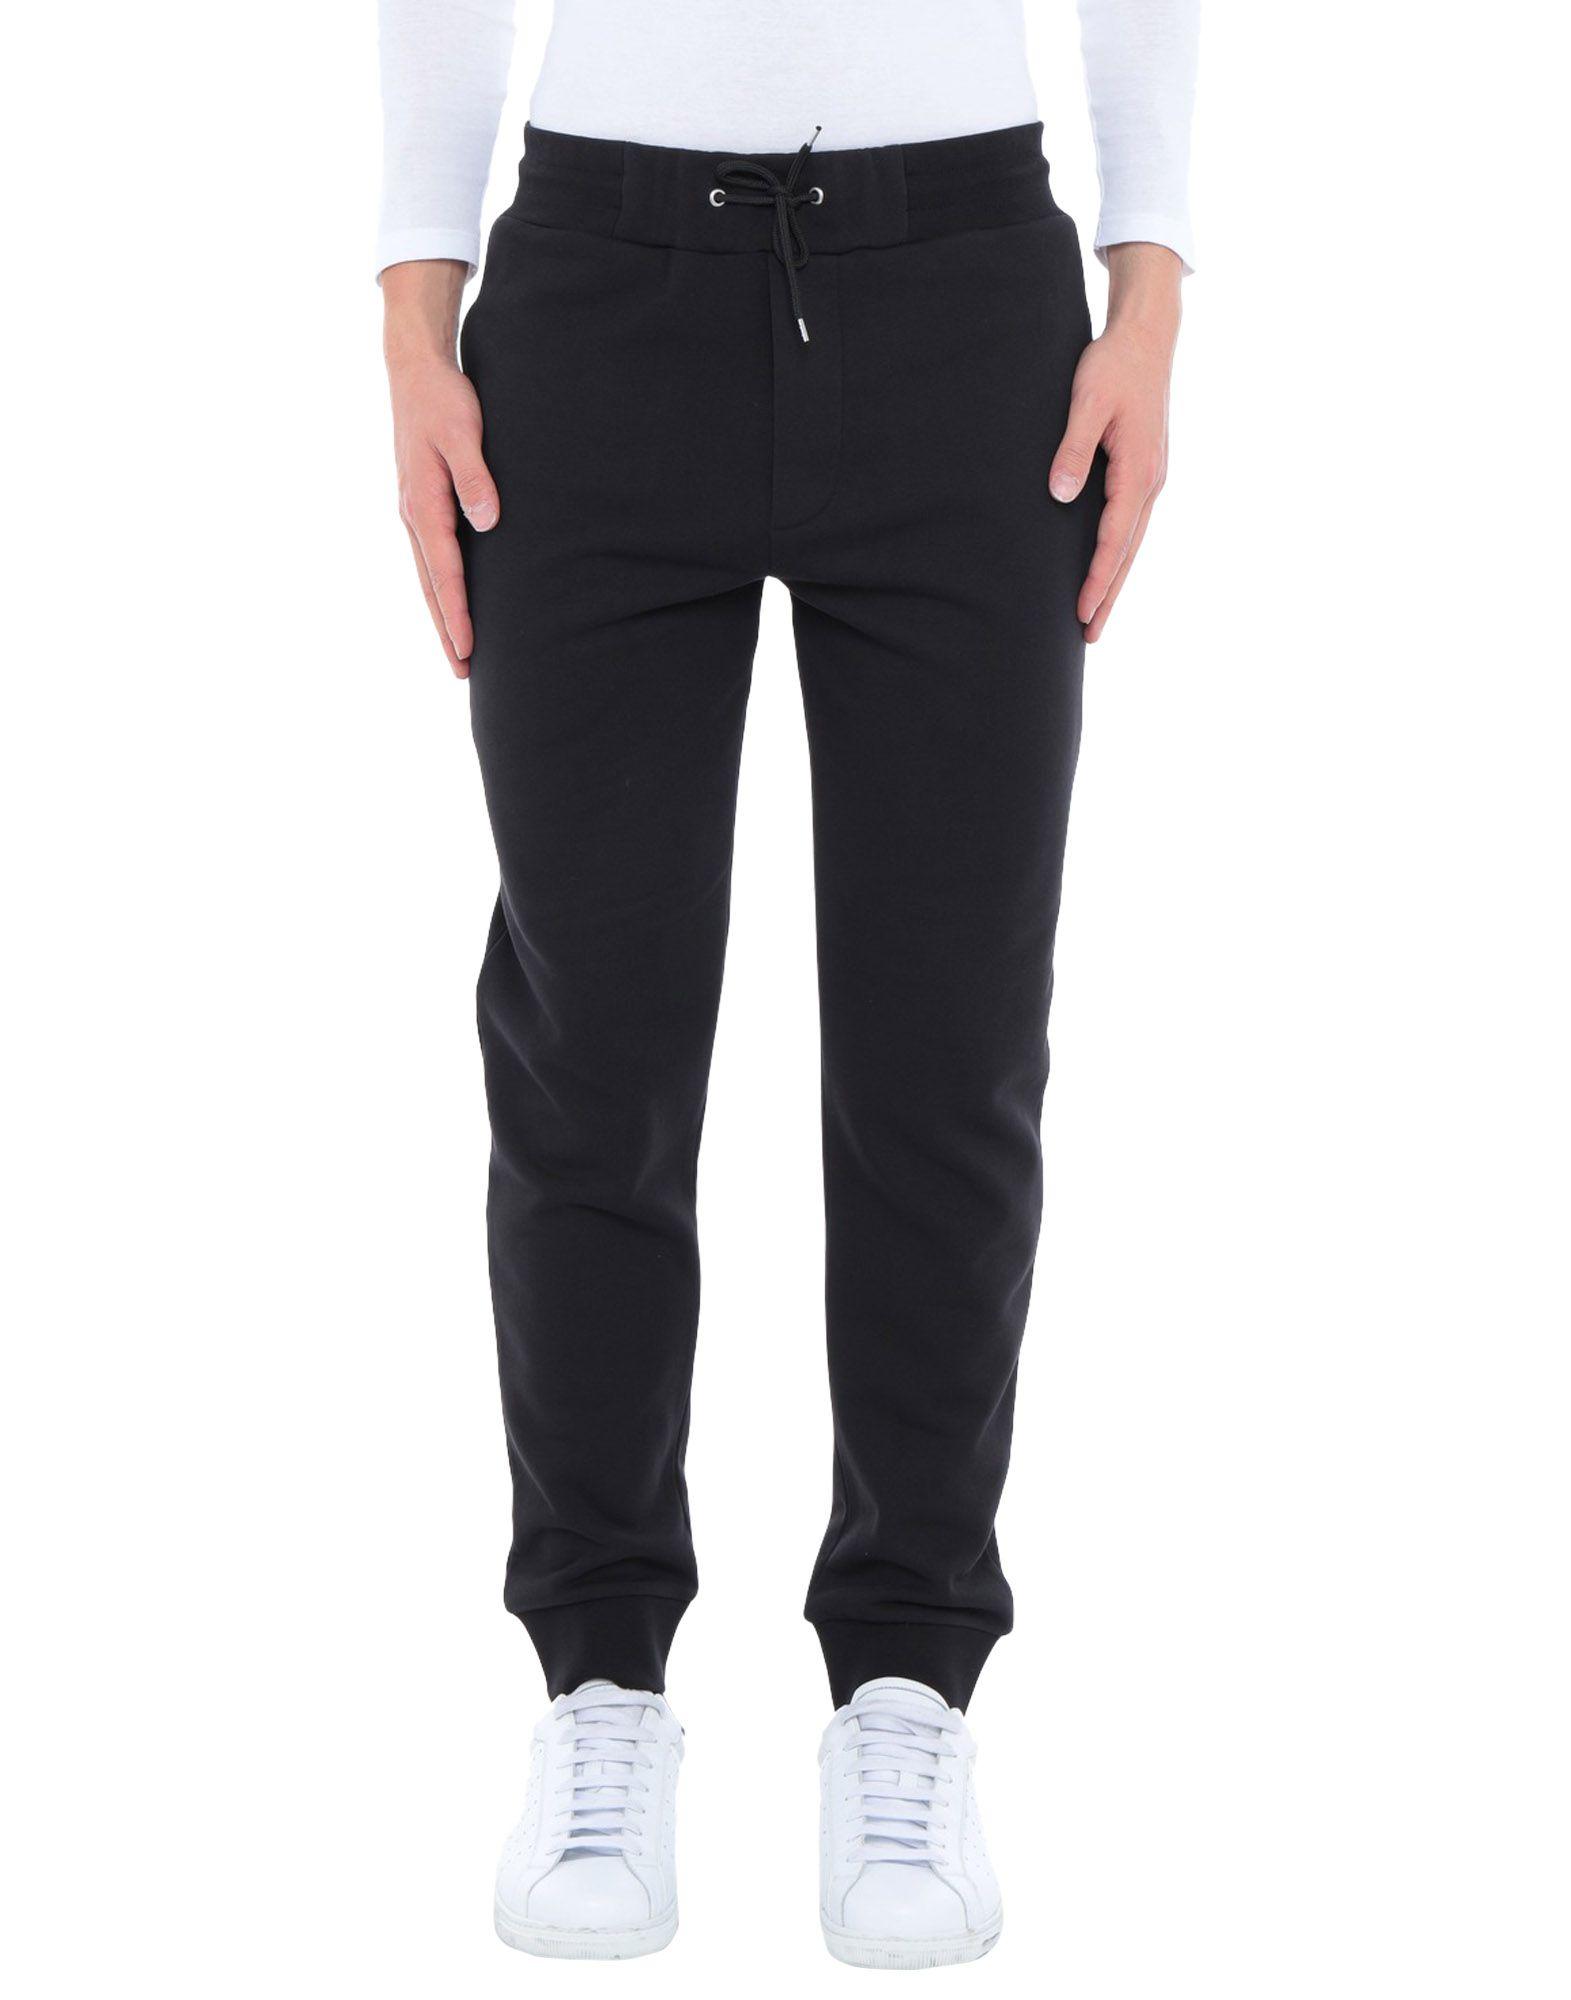 Pantalone Pantalone Mcq Alexander Mcqueen uomo - 13354389OR  Verkaufsstelle